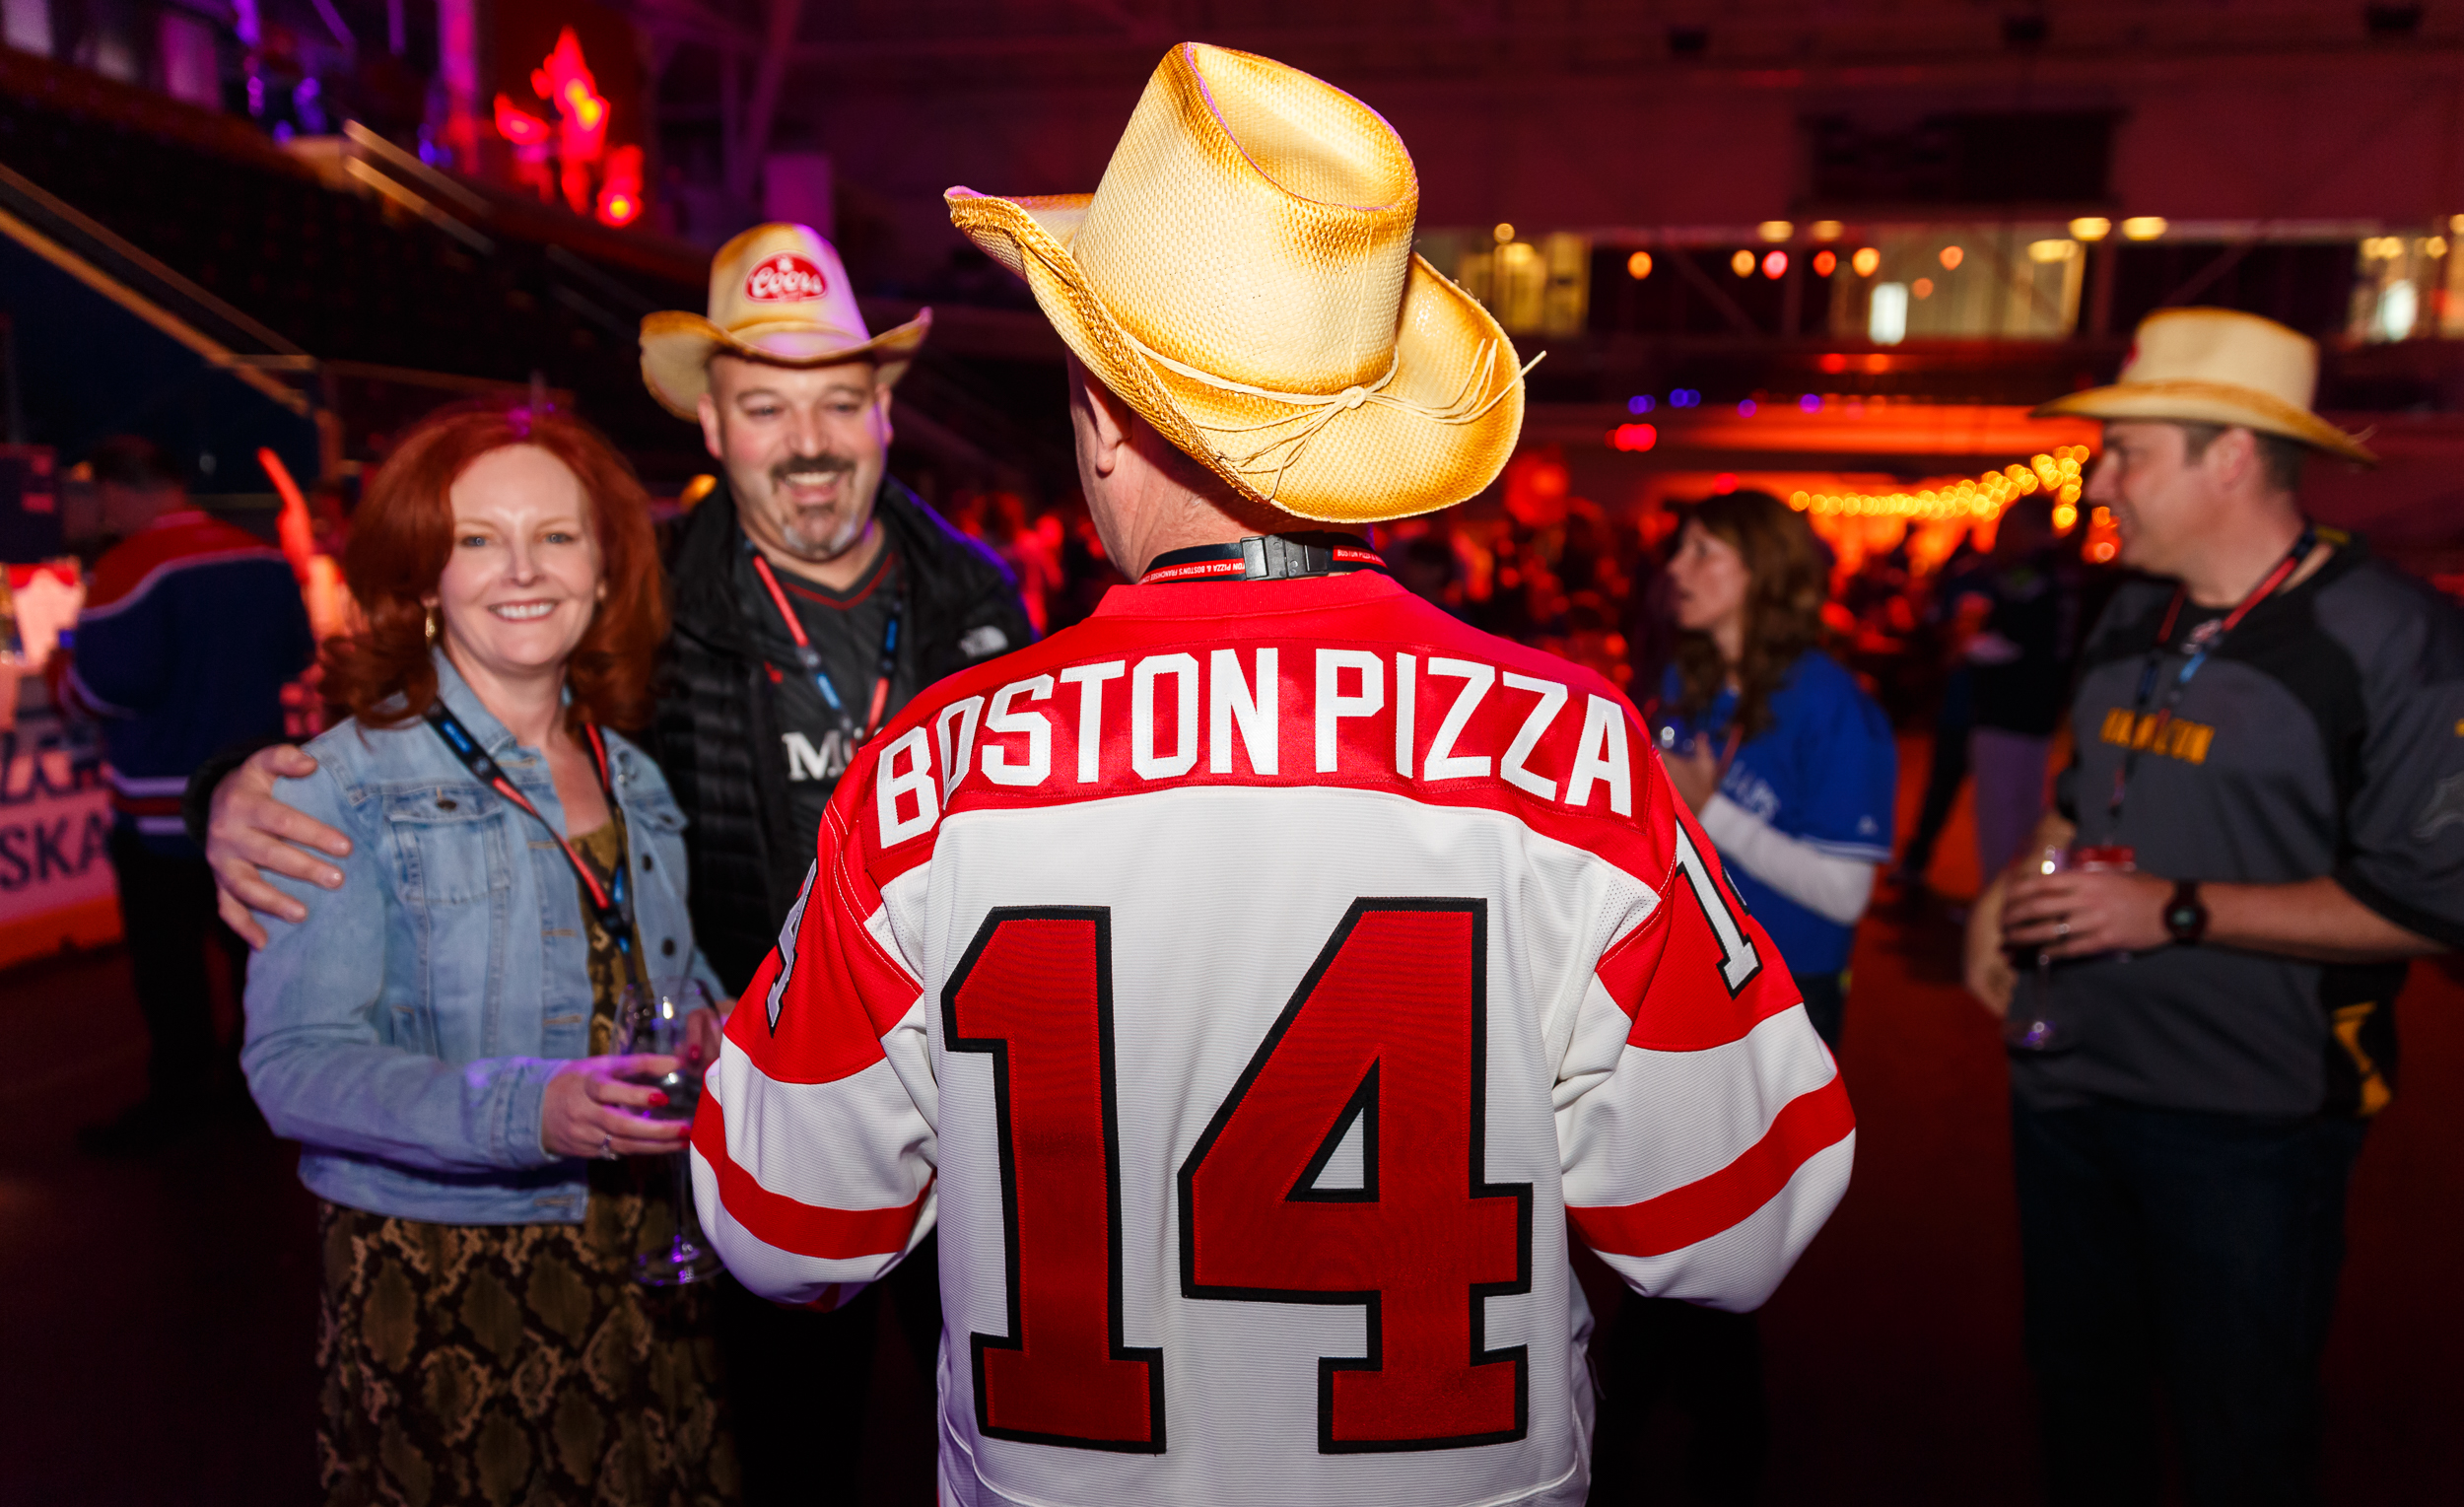 Boston-Pizza-Toronto-photo61.jpg